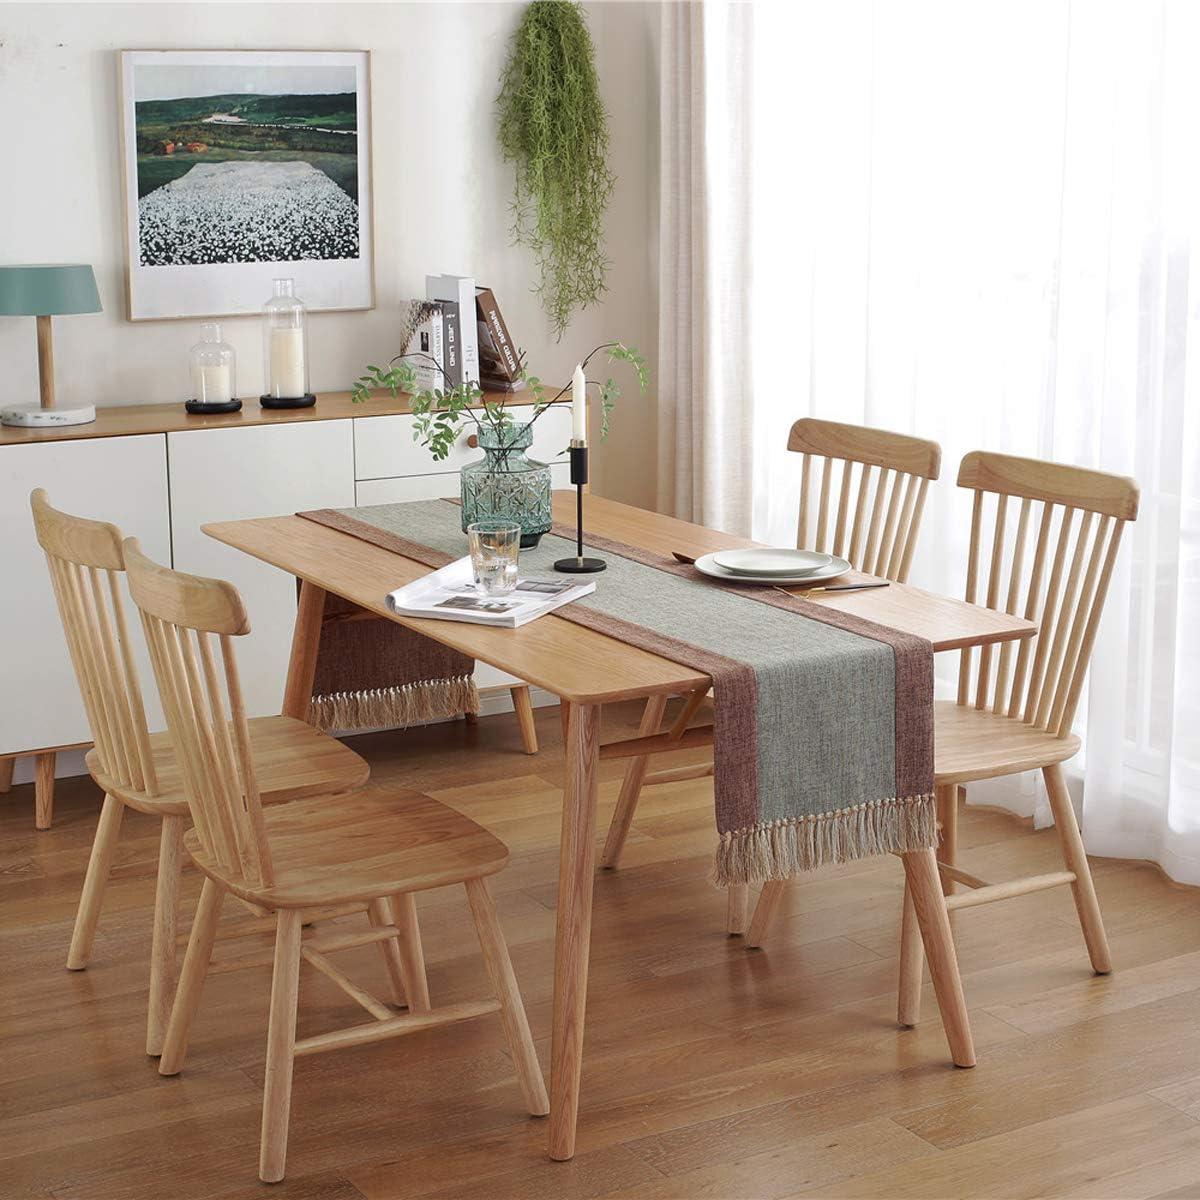 PHNAM Non-Slip Linen Long Green and Brown Table Runner with Tassels